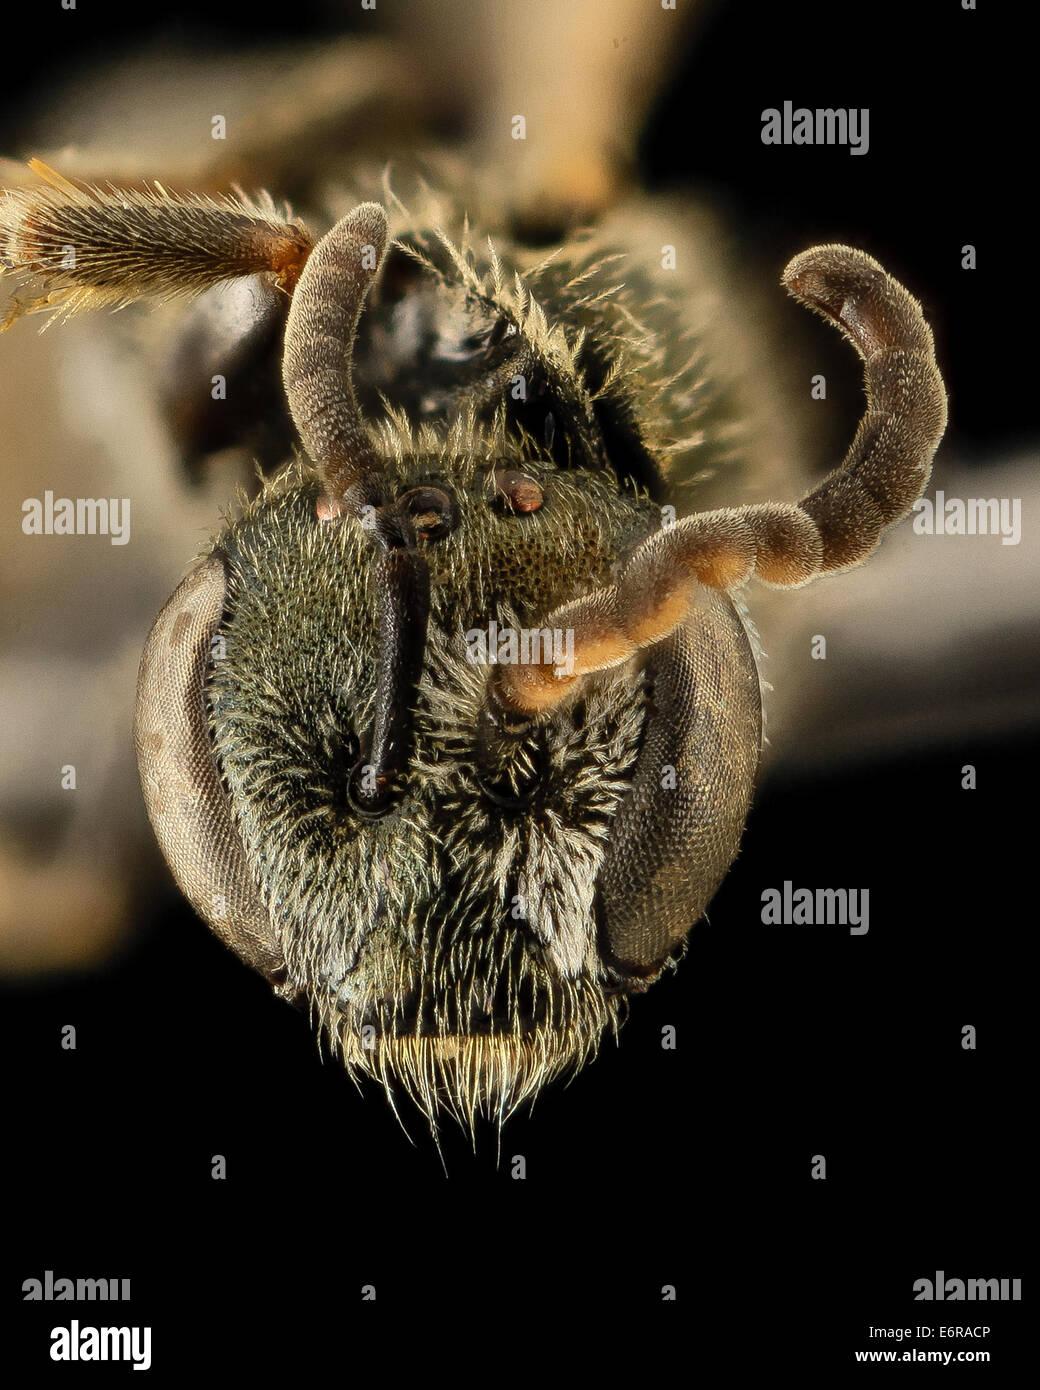 Gynandromorph, Lasioglossum hitchensi, Face, MD, St Mary's County_2014-05-27-163131 ZS PMax_14483966582_o Gynandromorph, - Stock Image